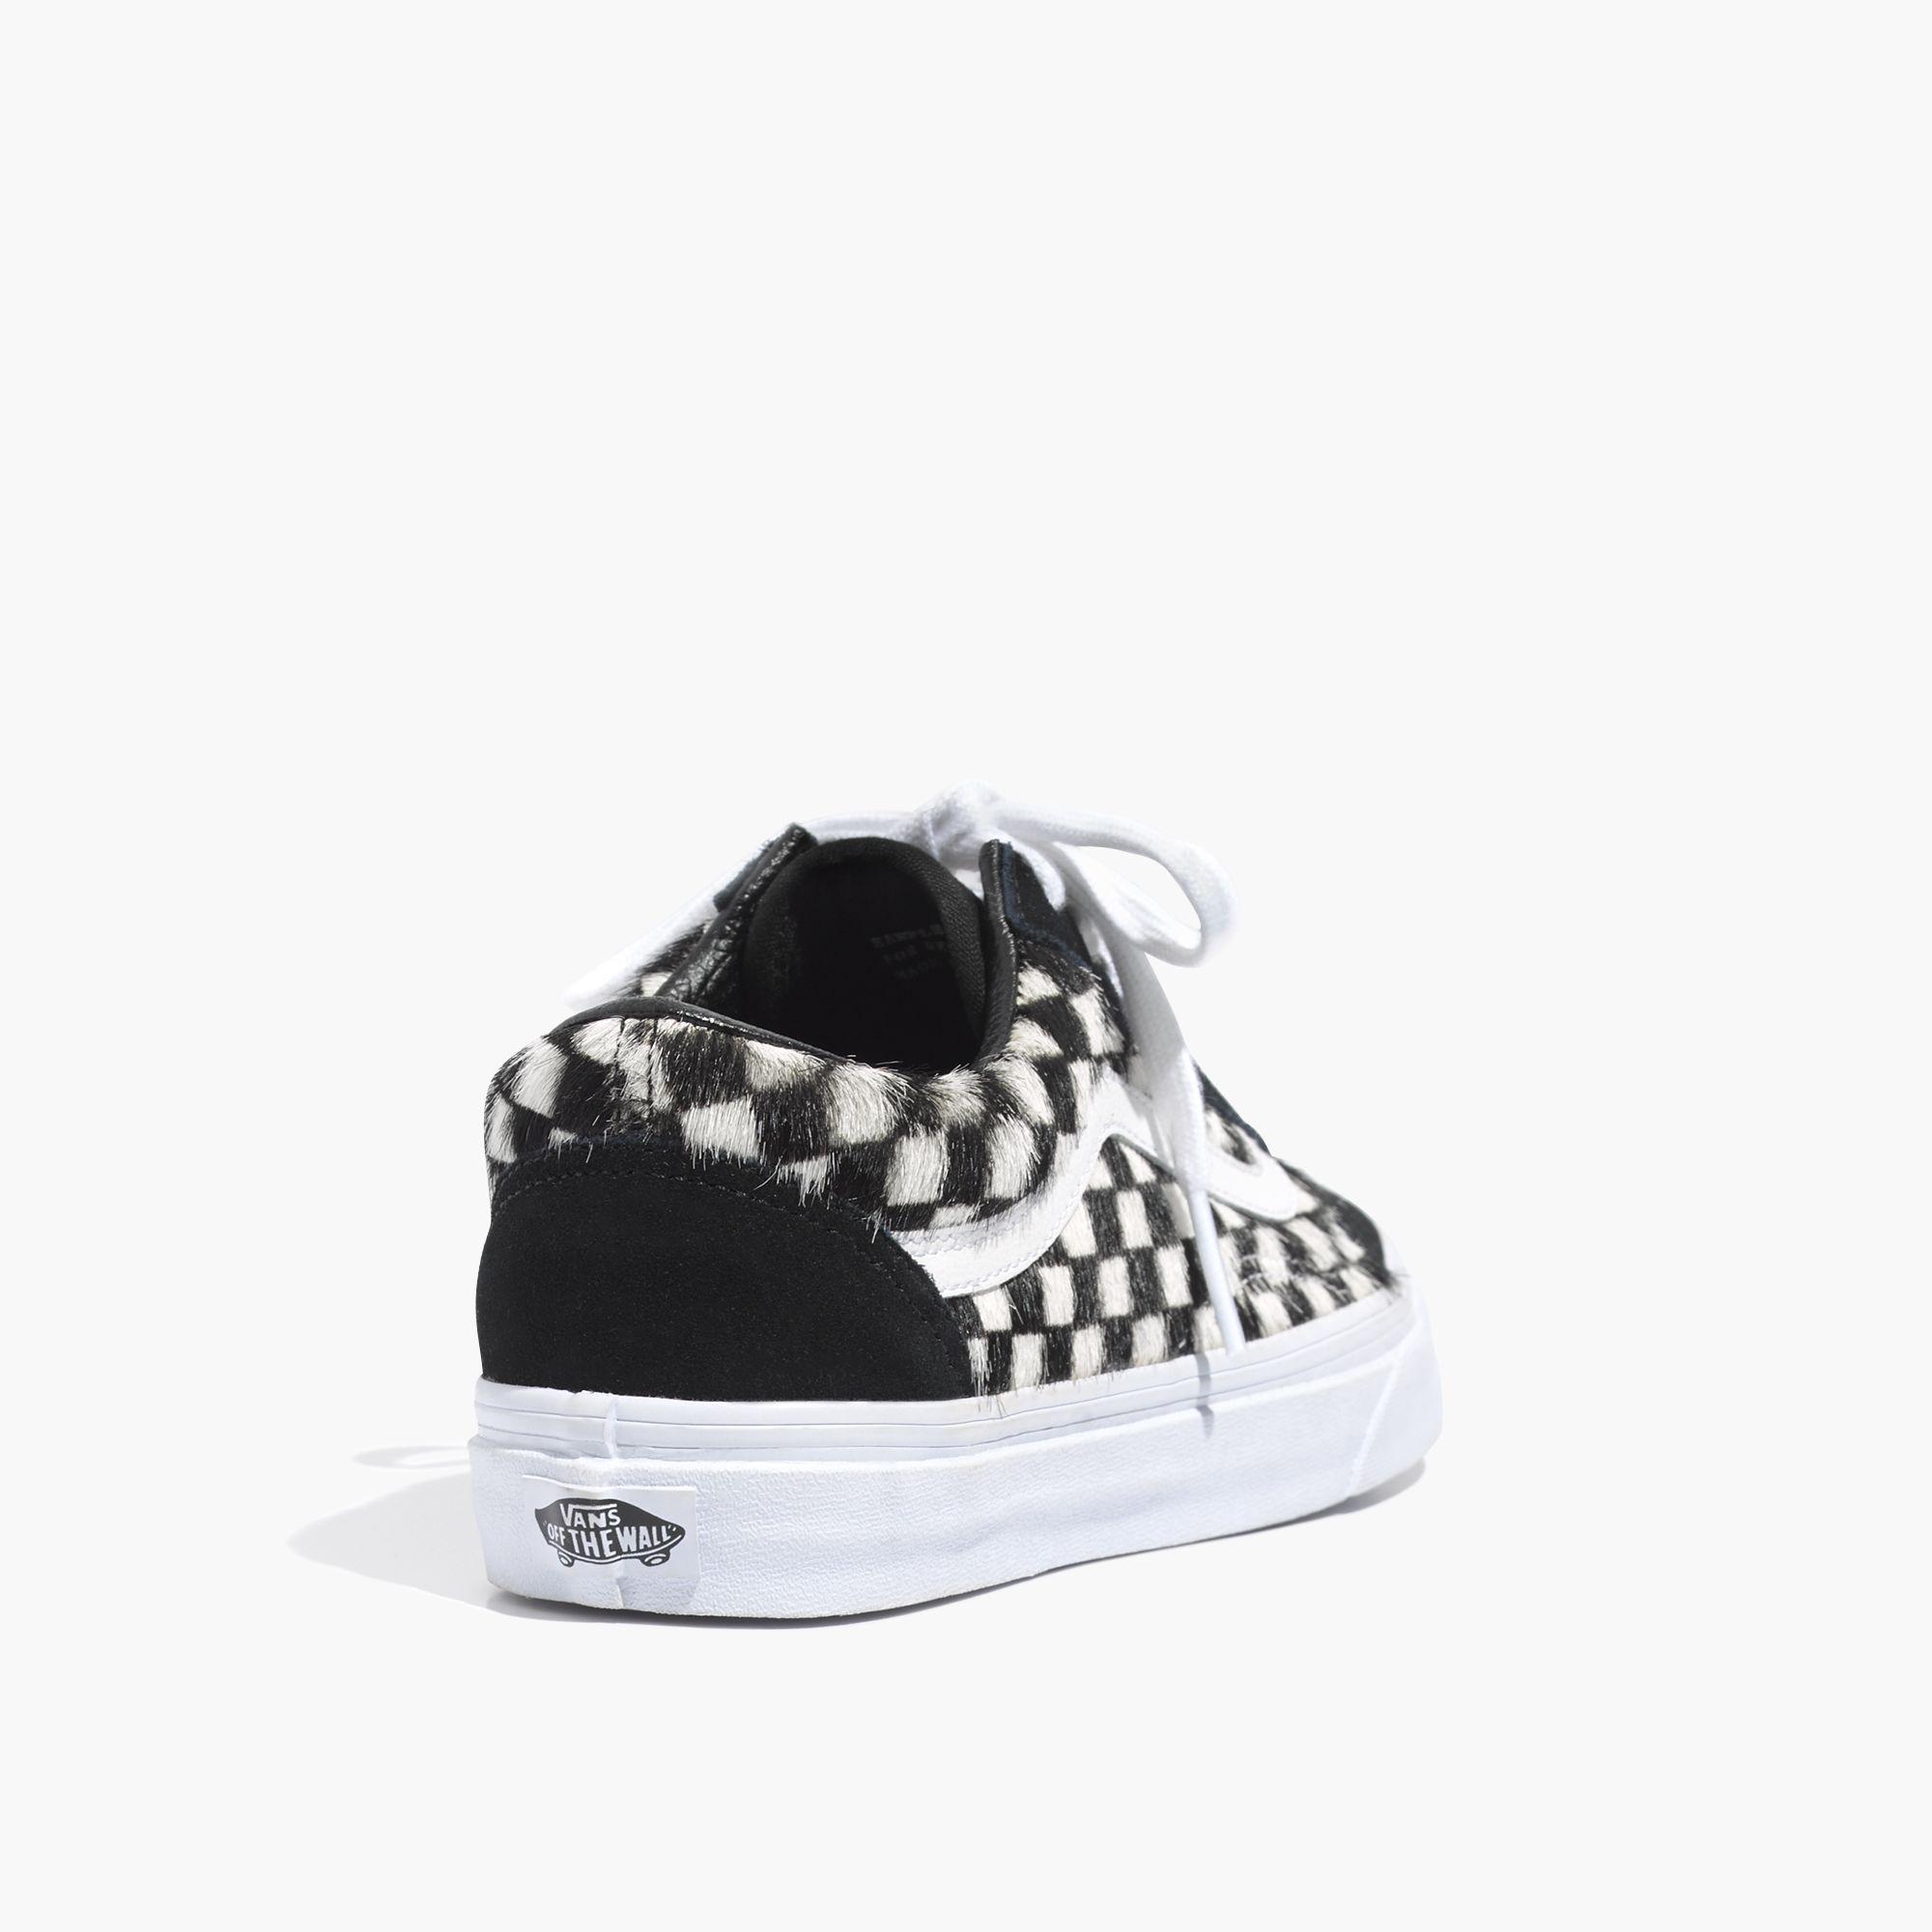 563c0458c70 Lyst - Vans Madewell X ® Unisex Old Skool Lace-up Sneakers In ...